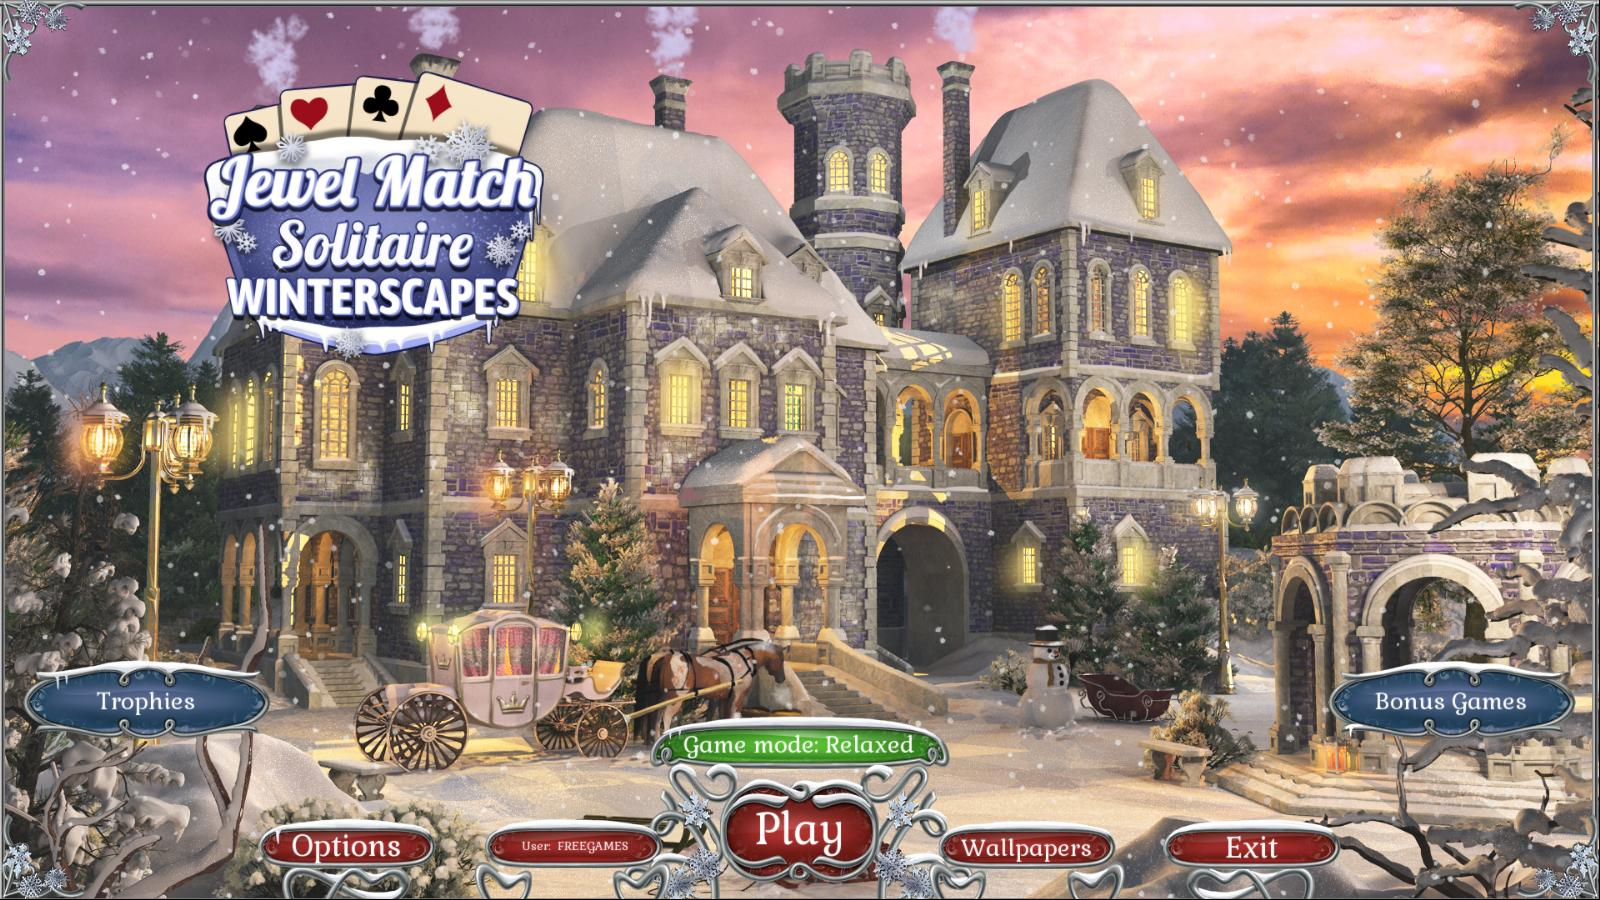 Пасьянс: Зимние пейзажи | Jewel Match Solitaire: Winterscapes (En)